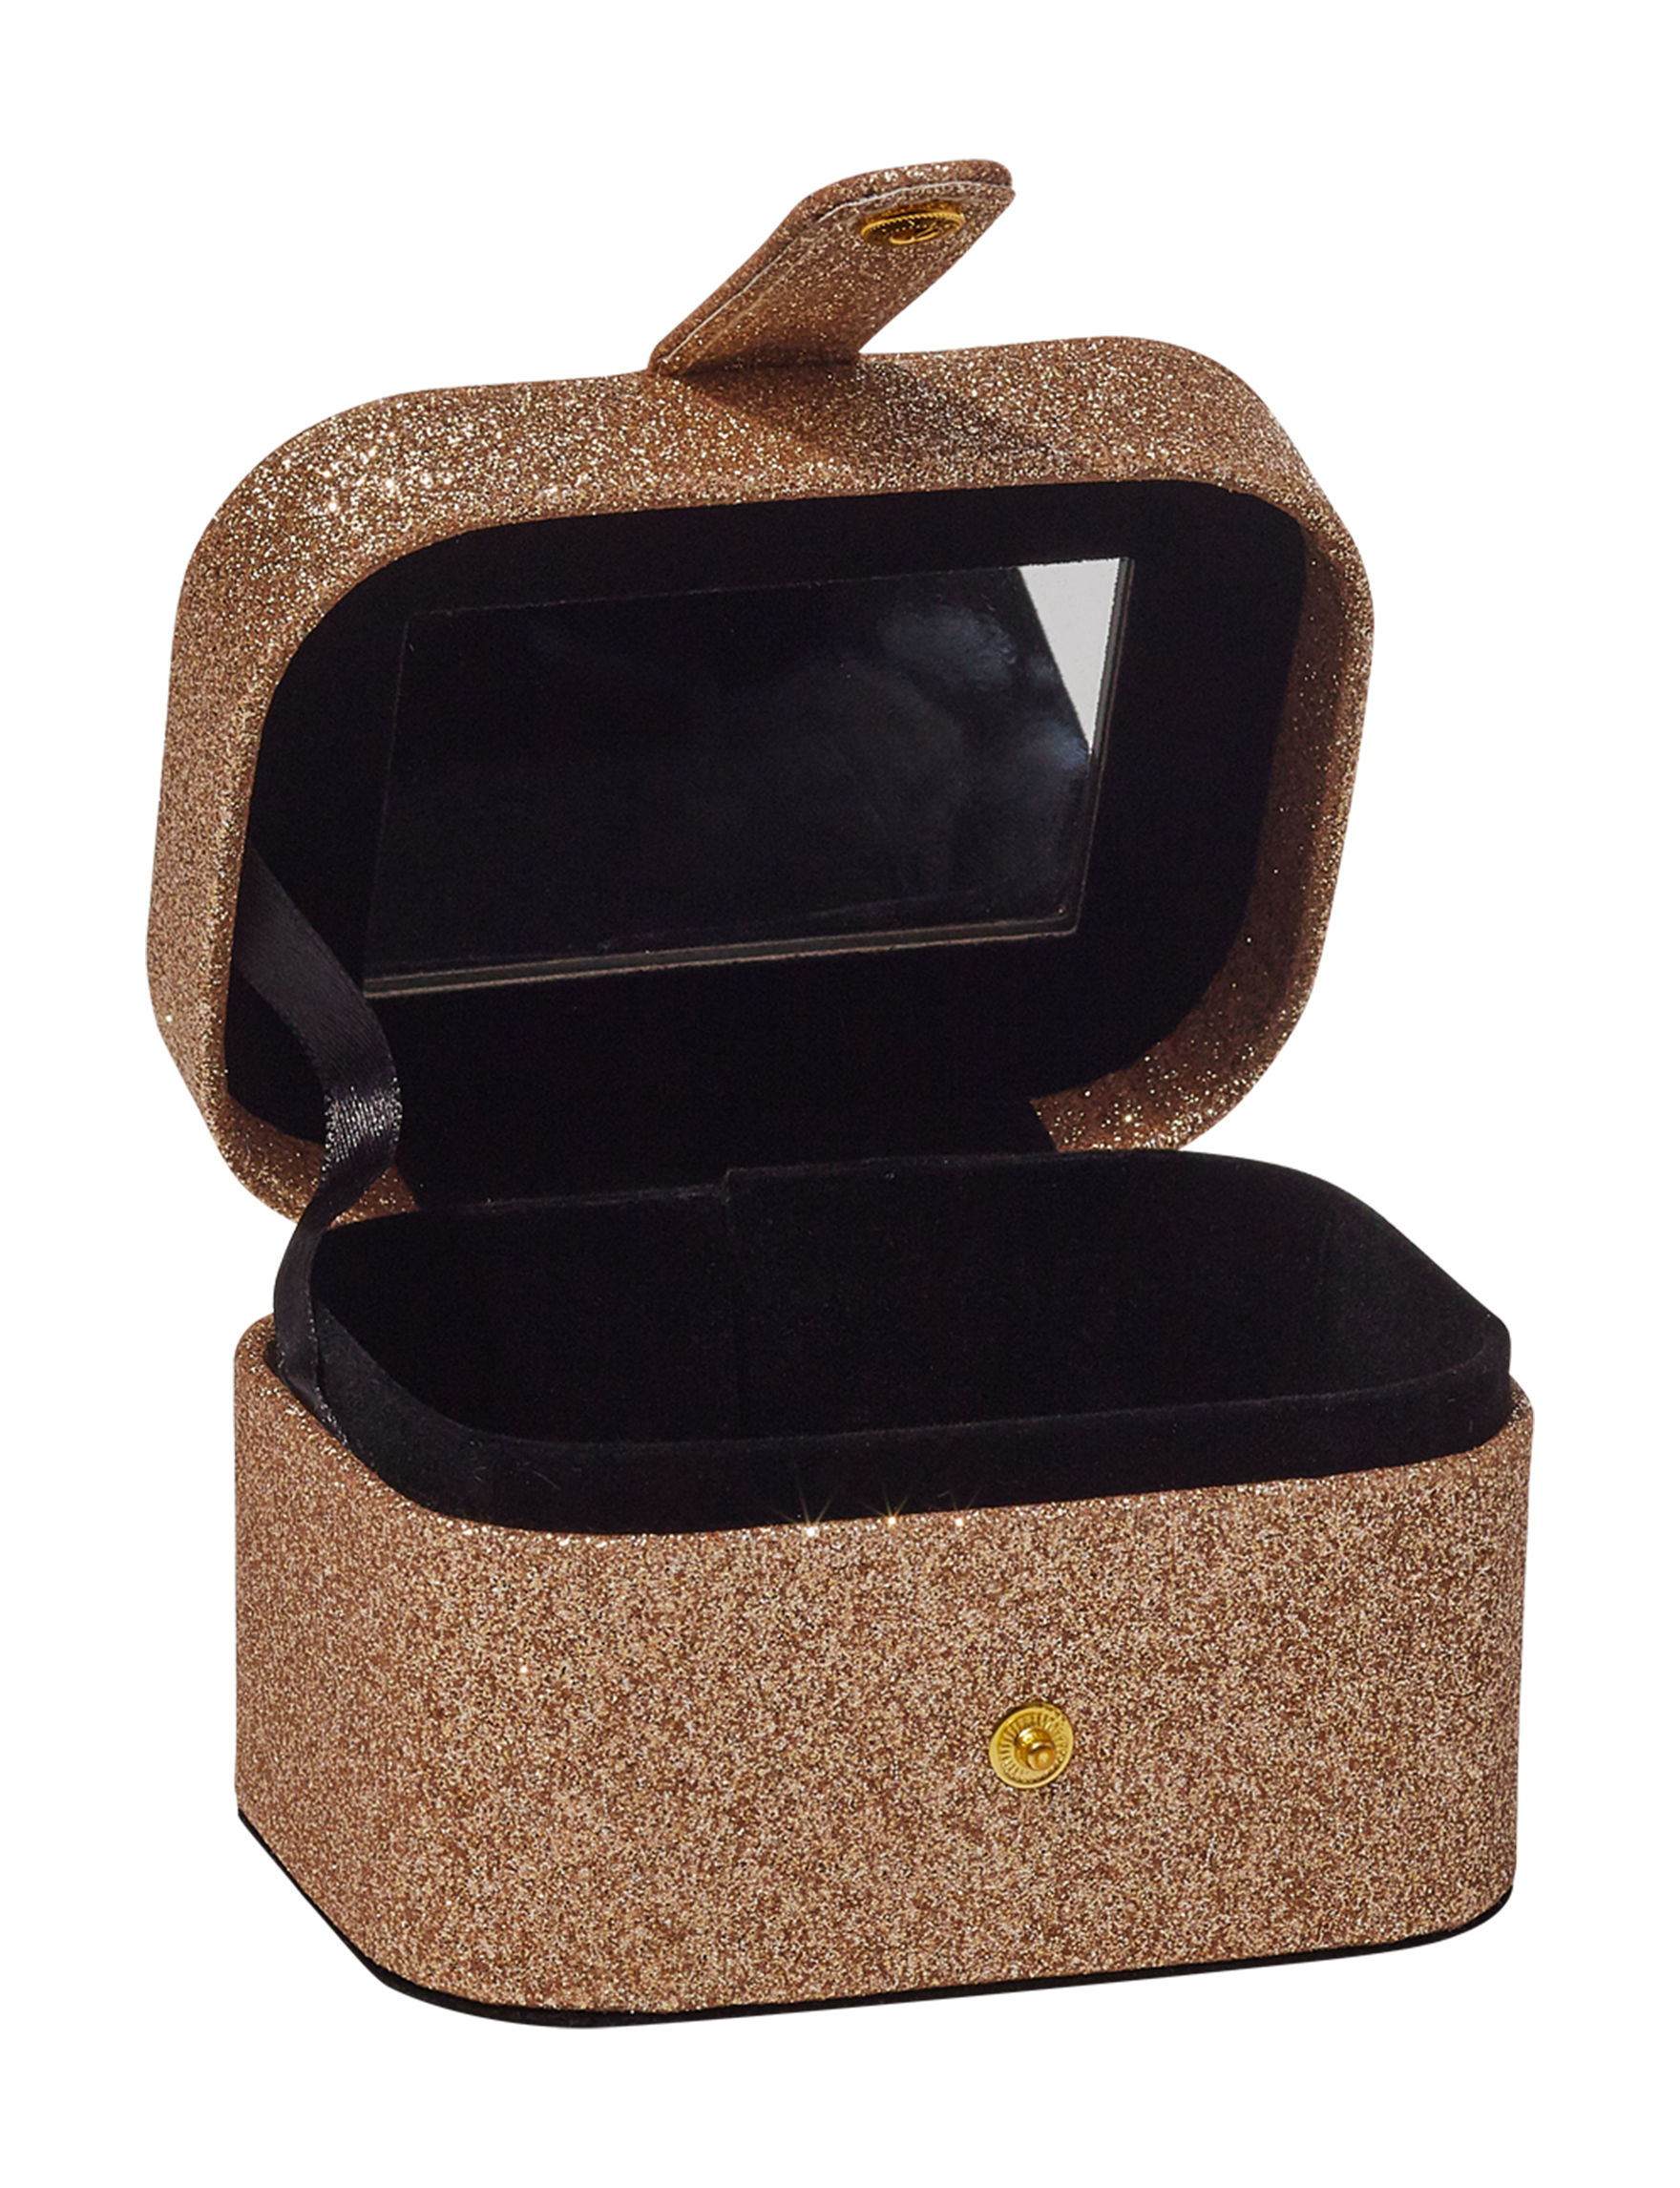 Tri Coastal Metallic Gold Accessories Home Accents